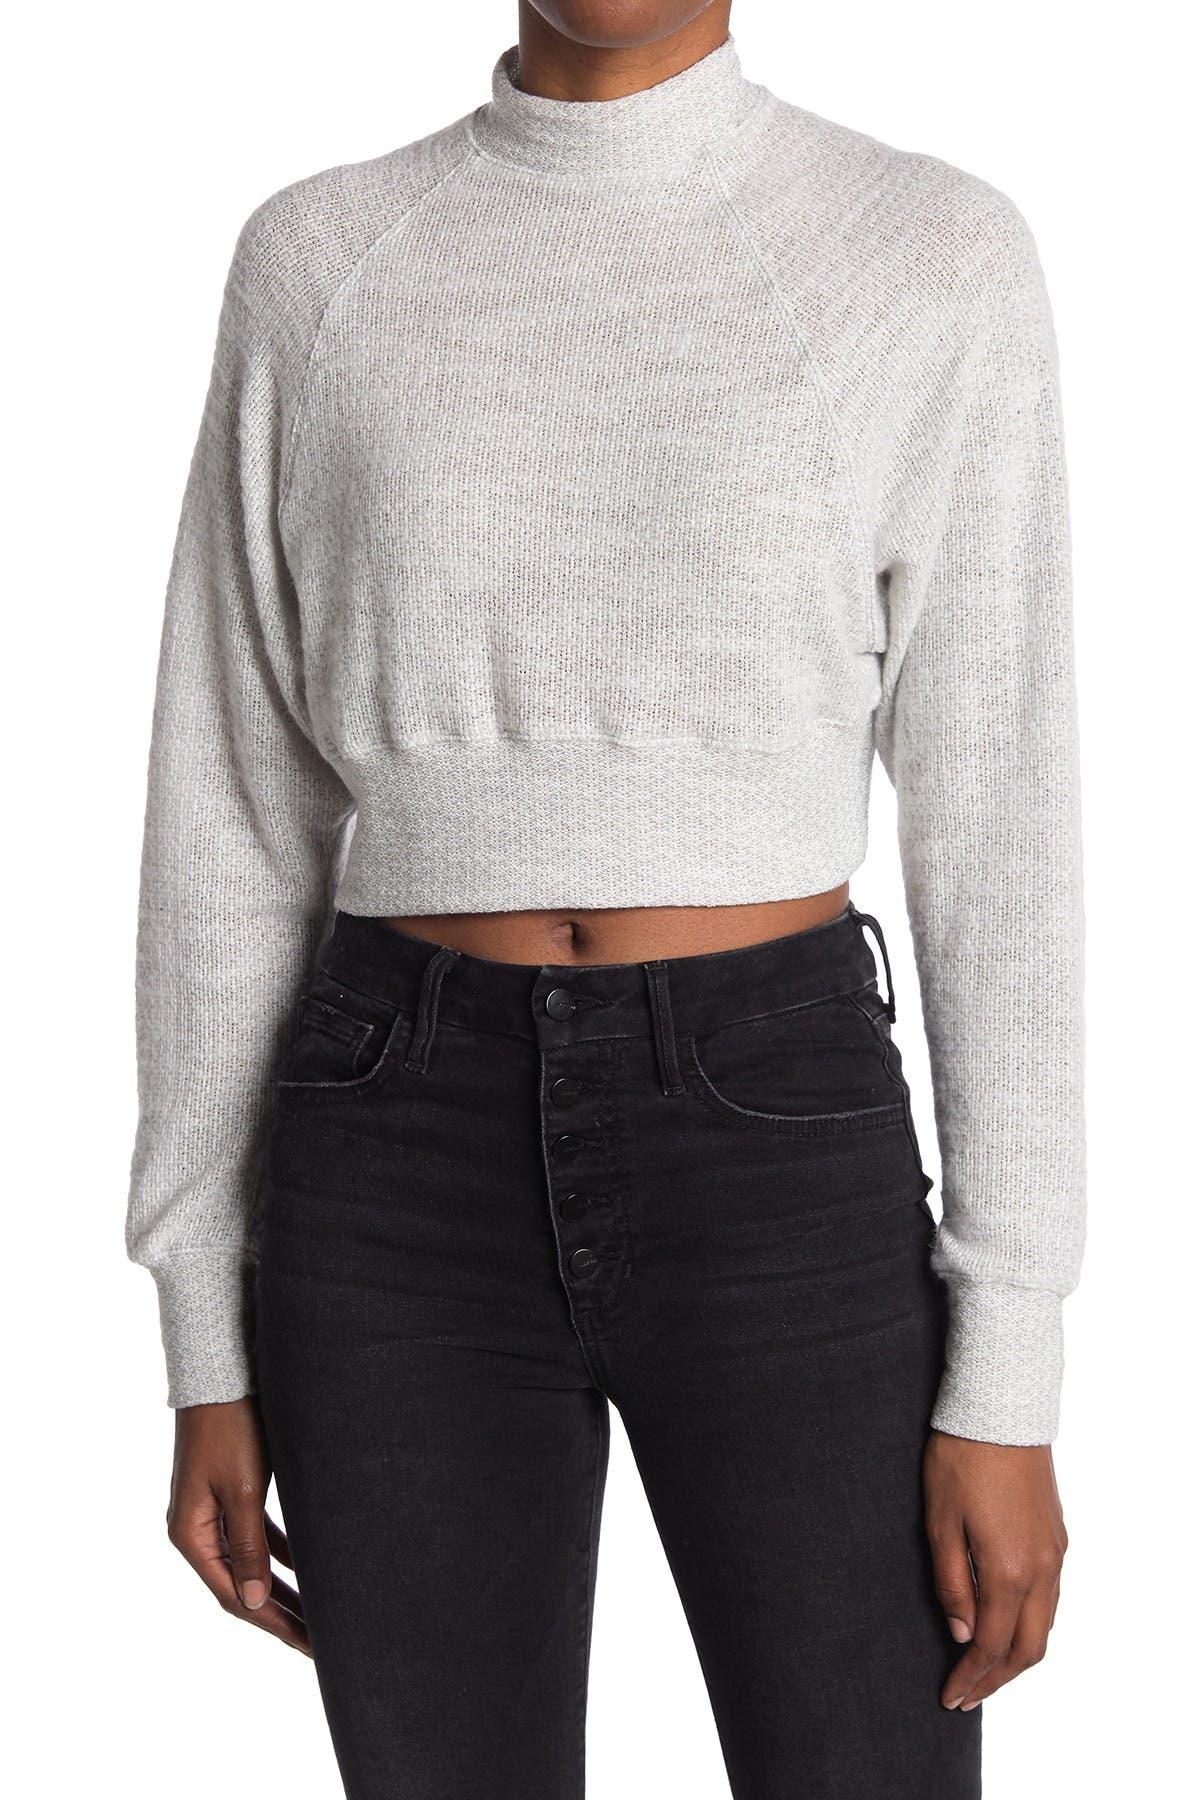 Image of Abound Mock Neck Long Sleeve Sweater